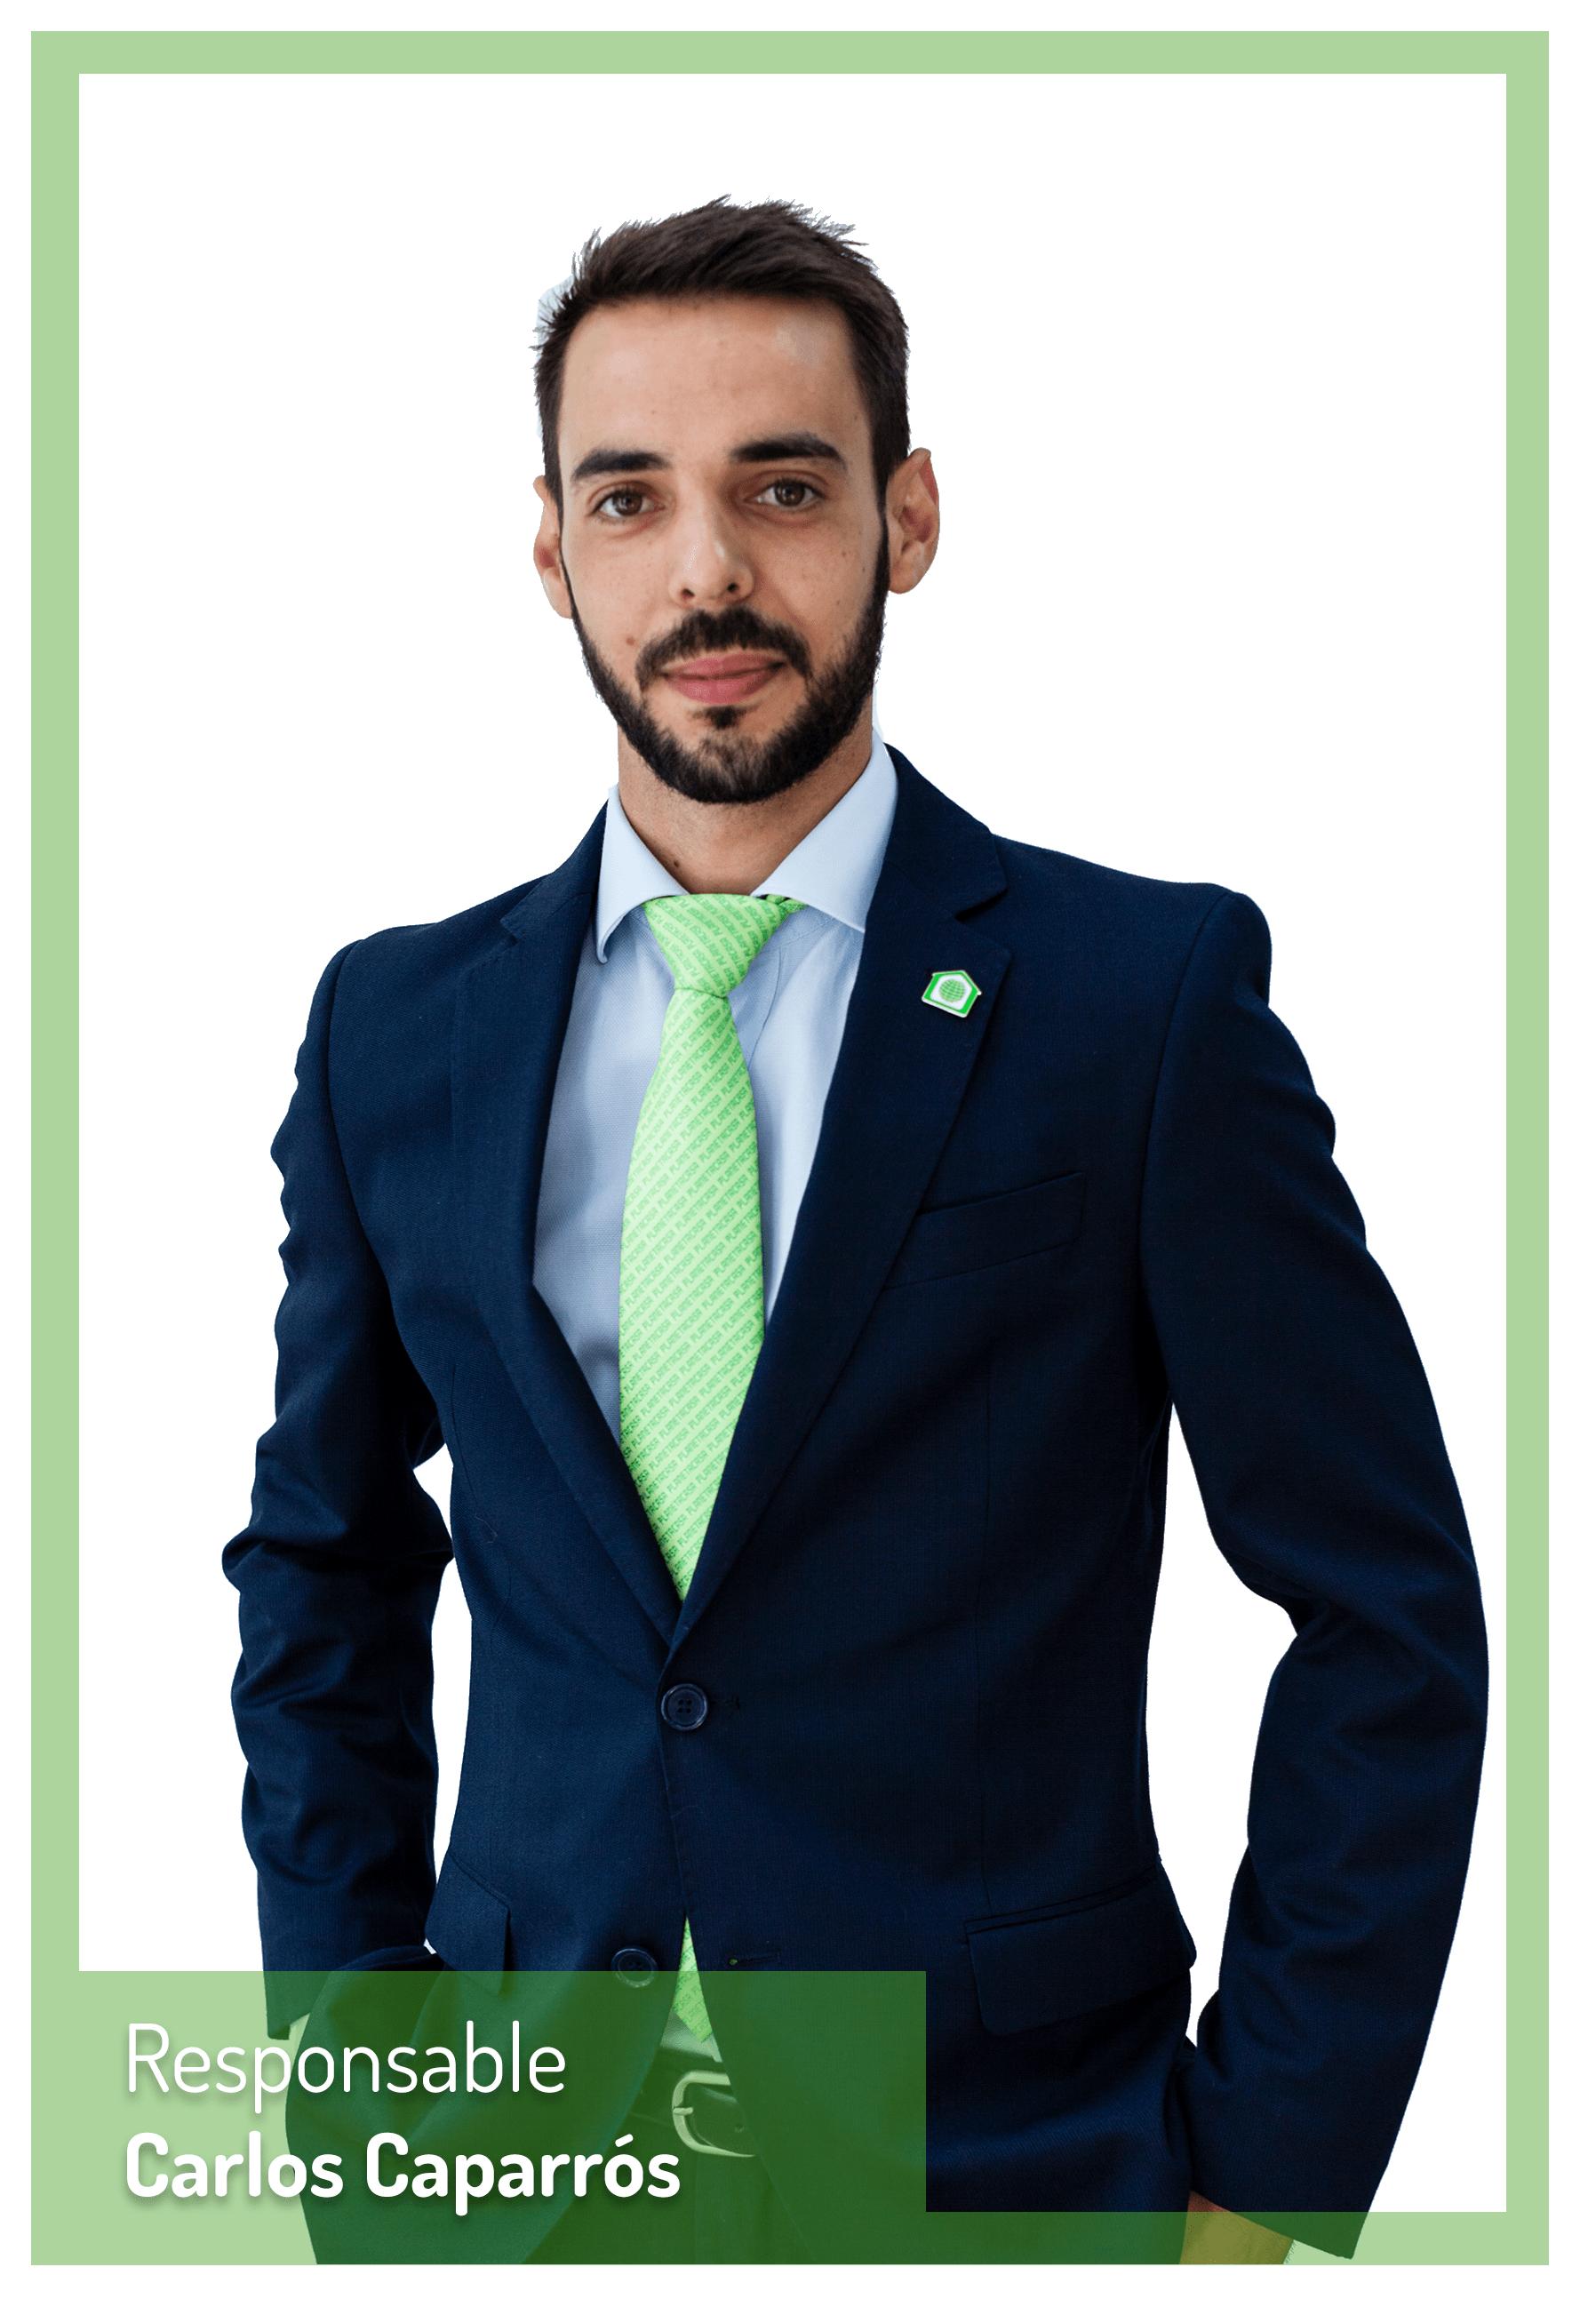 Carlos caparros responsable Planetacasa Inmobiliarias Malaga